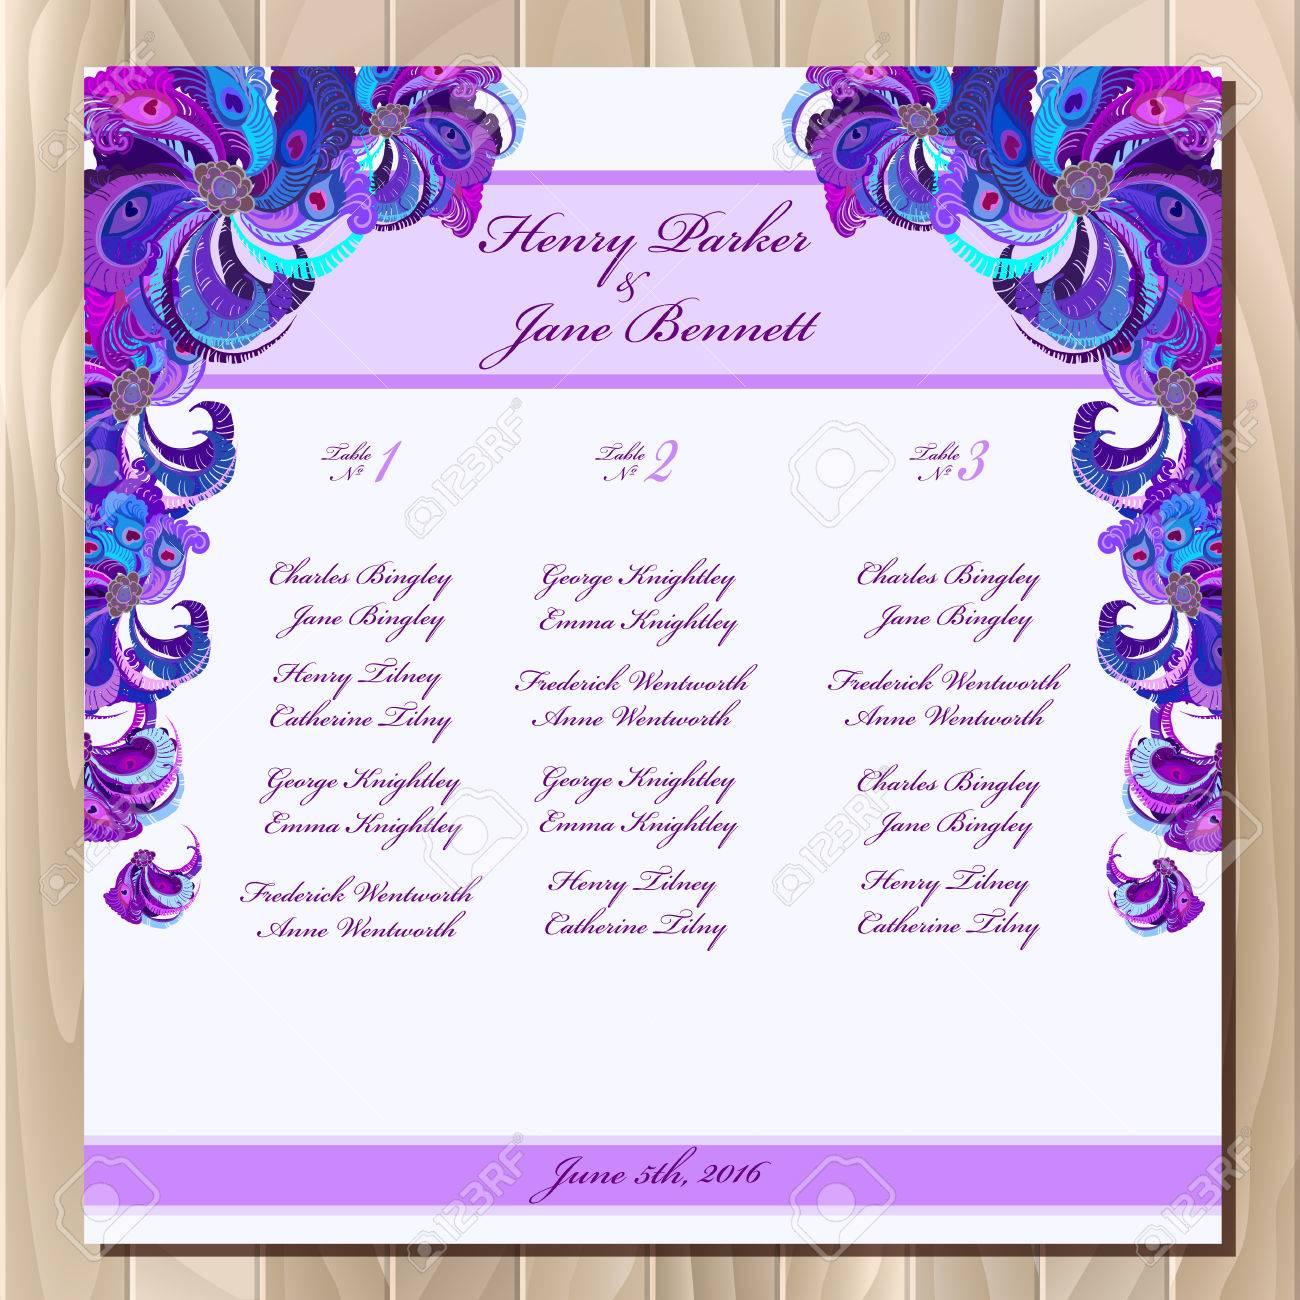 Doc601468 Wedding Guest List Printable Template Sample – Guest List Sample